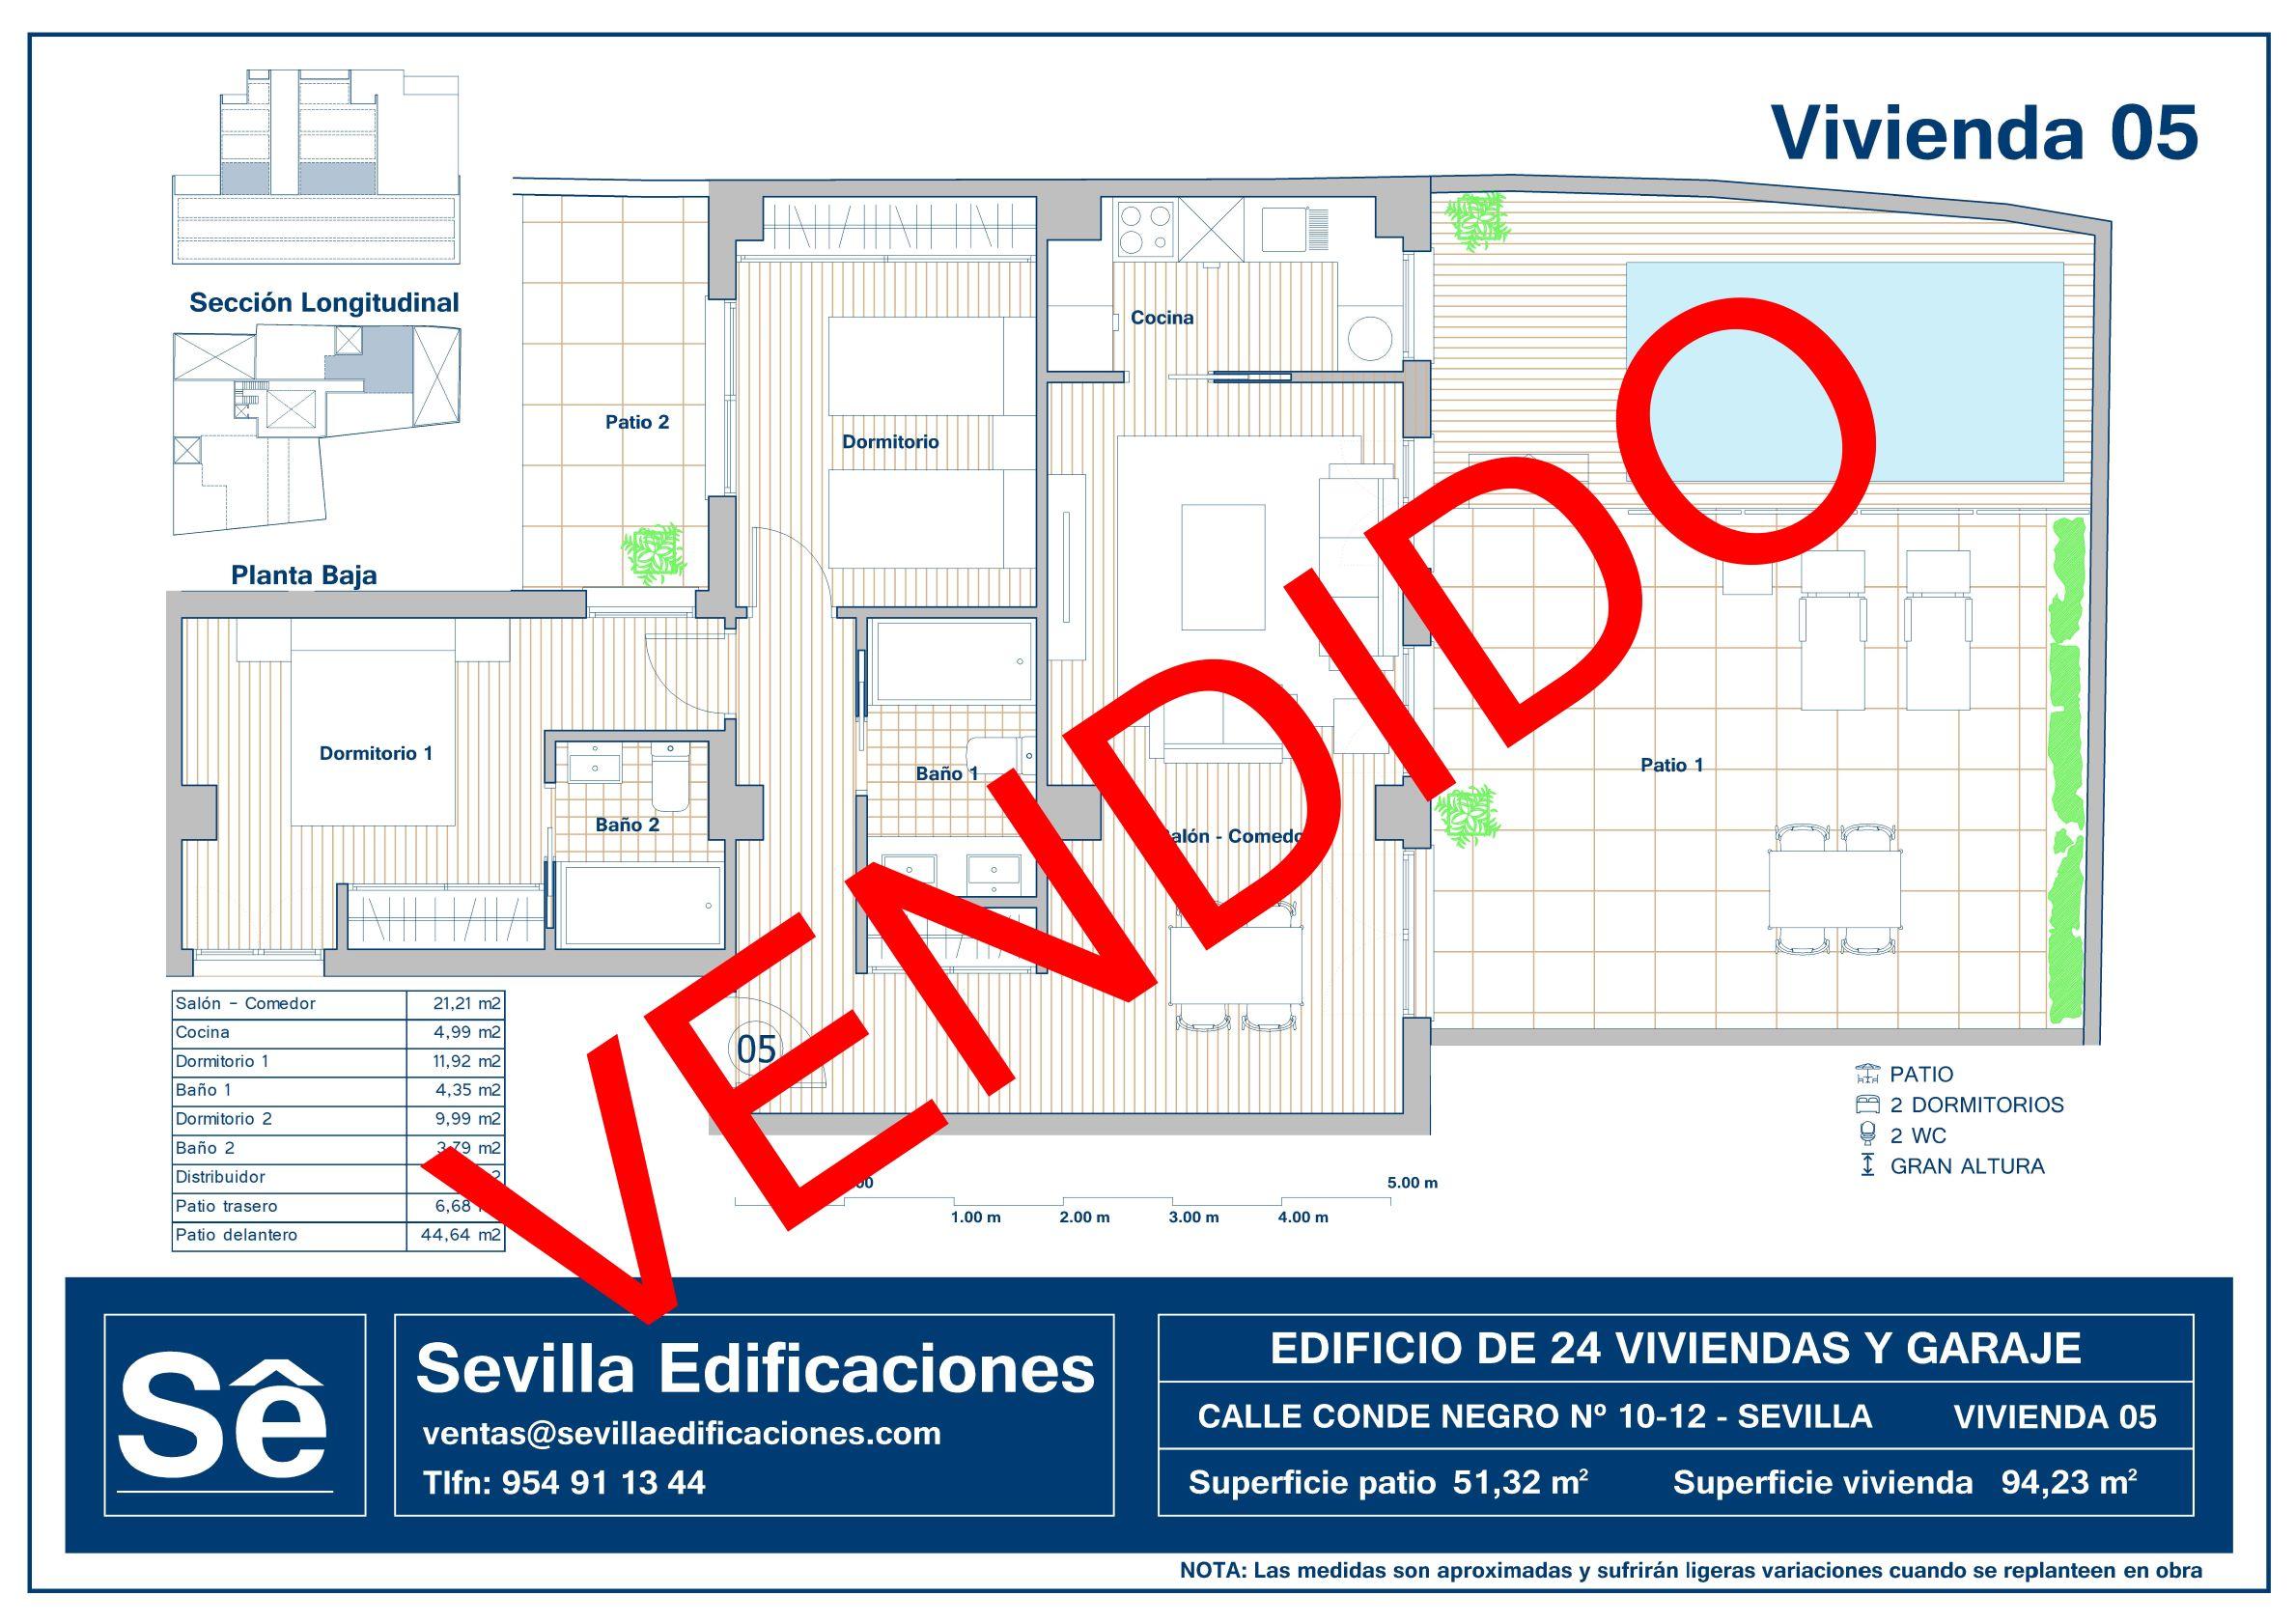 CONDENEGRO_VIVIENDA_05_VENDIDO